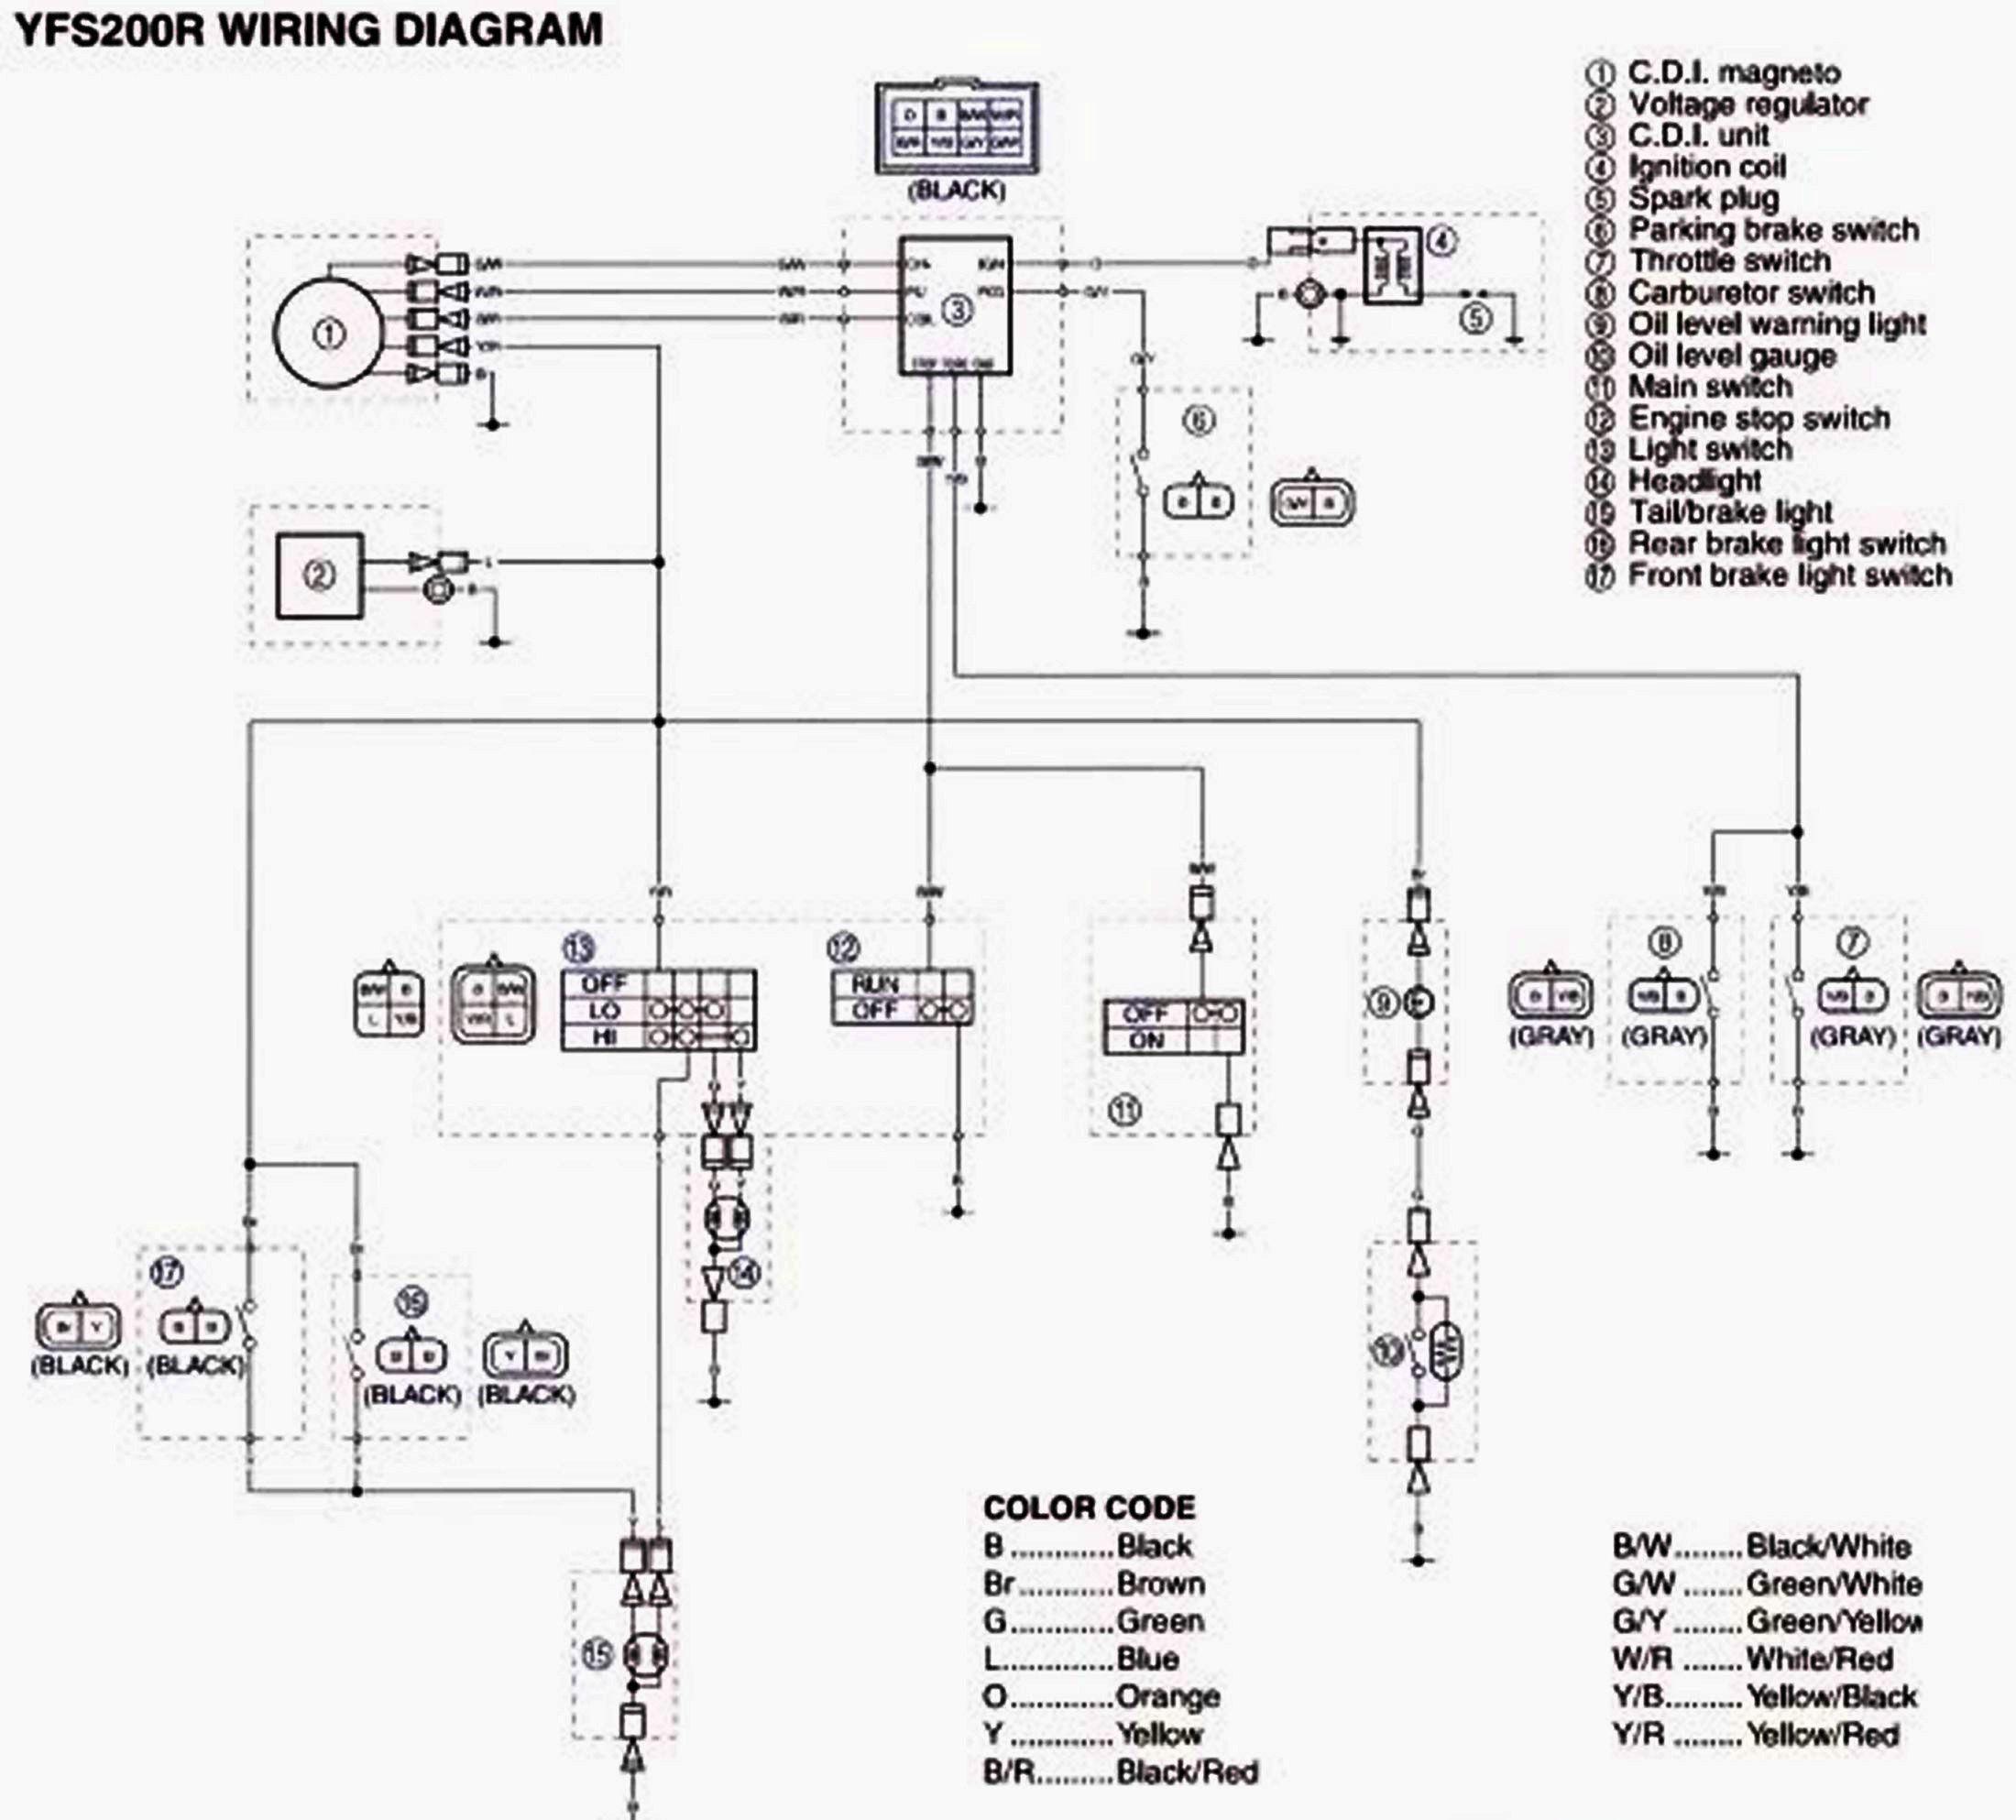 Trim Tab Mercruiser Wiring Diagram Detailed Schematics 3 0 Snap Lenco Tabs Copy Best Of Hp Mercury Outboard